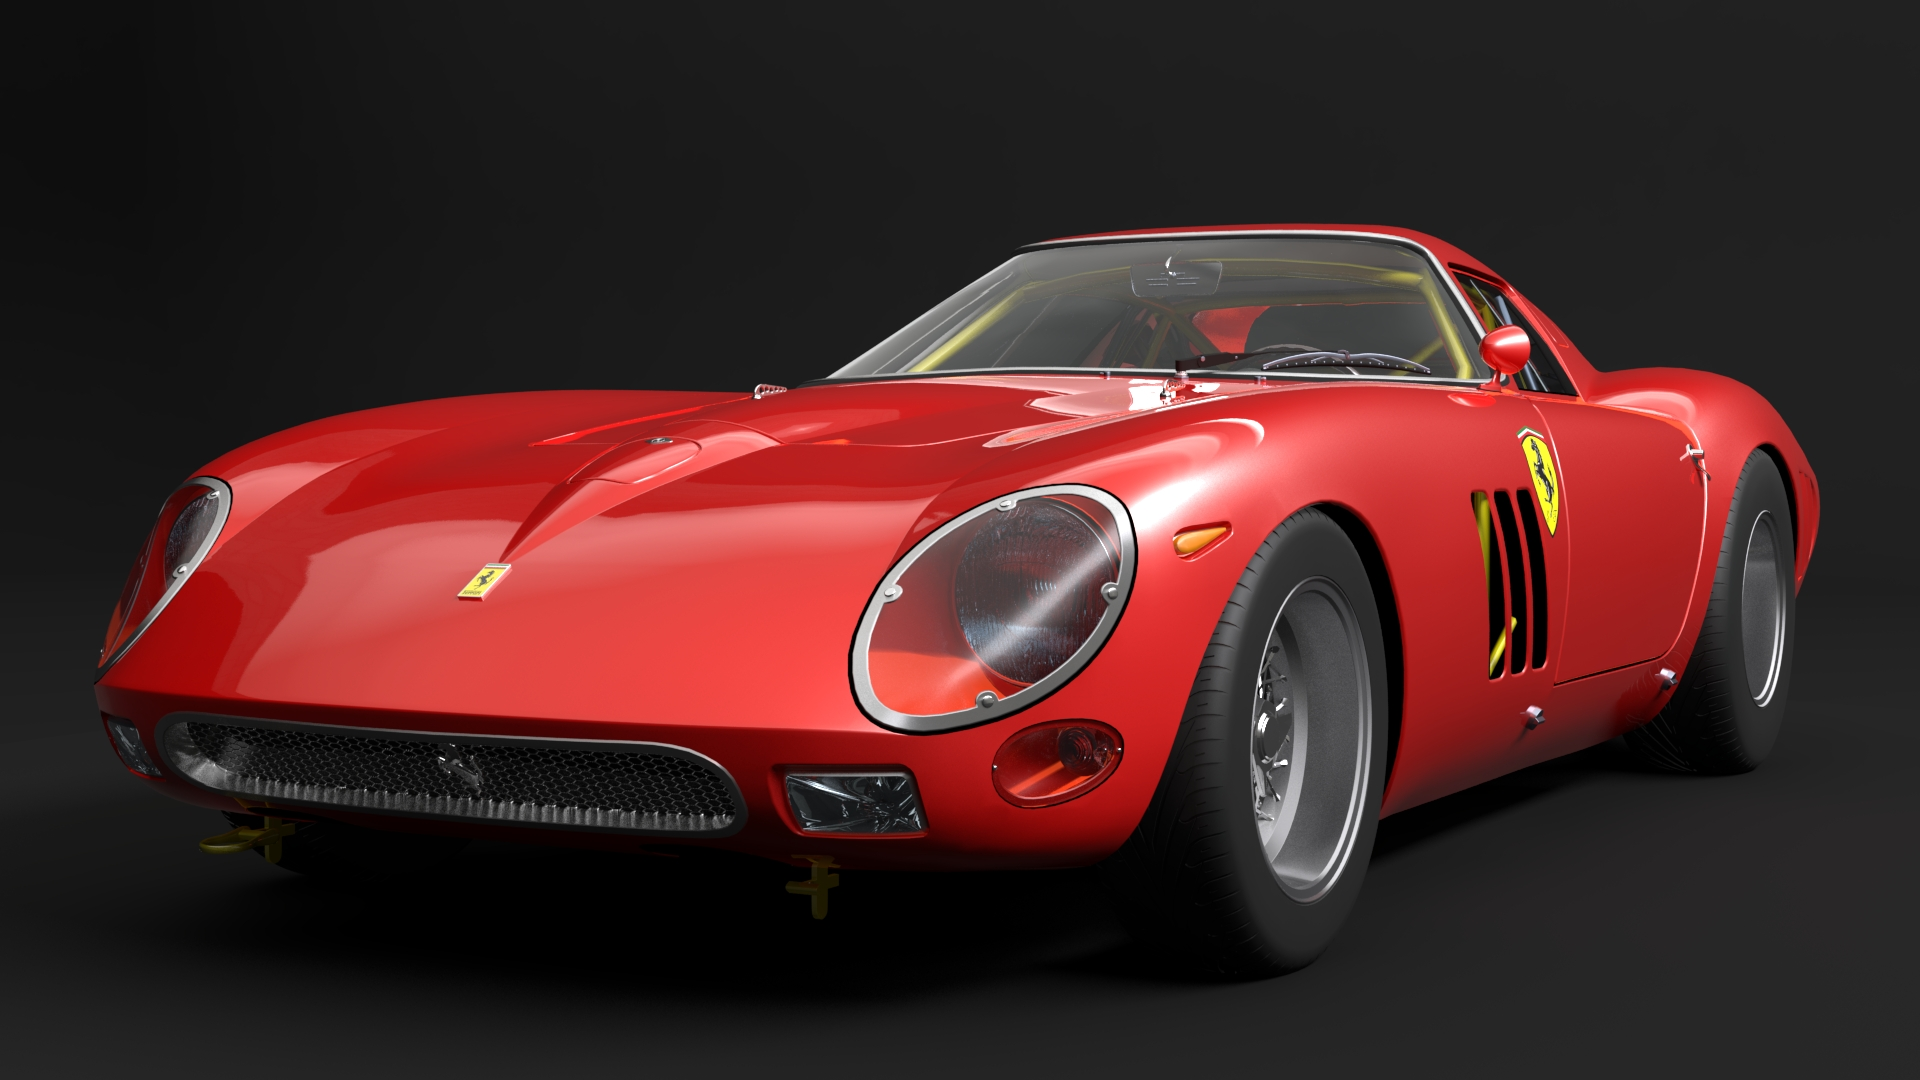 Ferrari 250 Gto Wallpapers: Ferrari 250 GTO Wallpaper 29